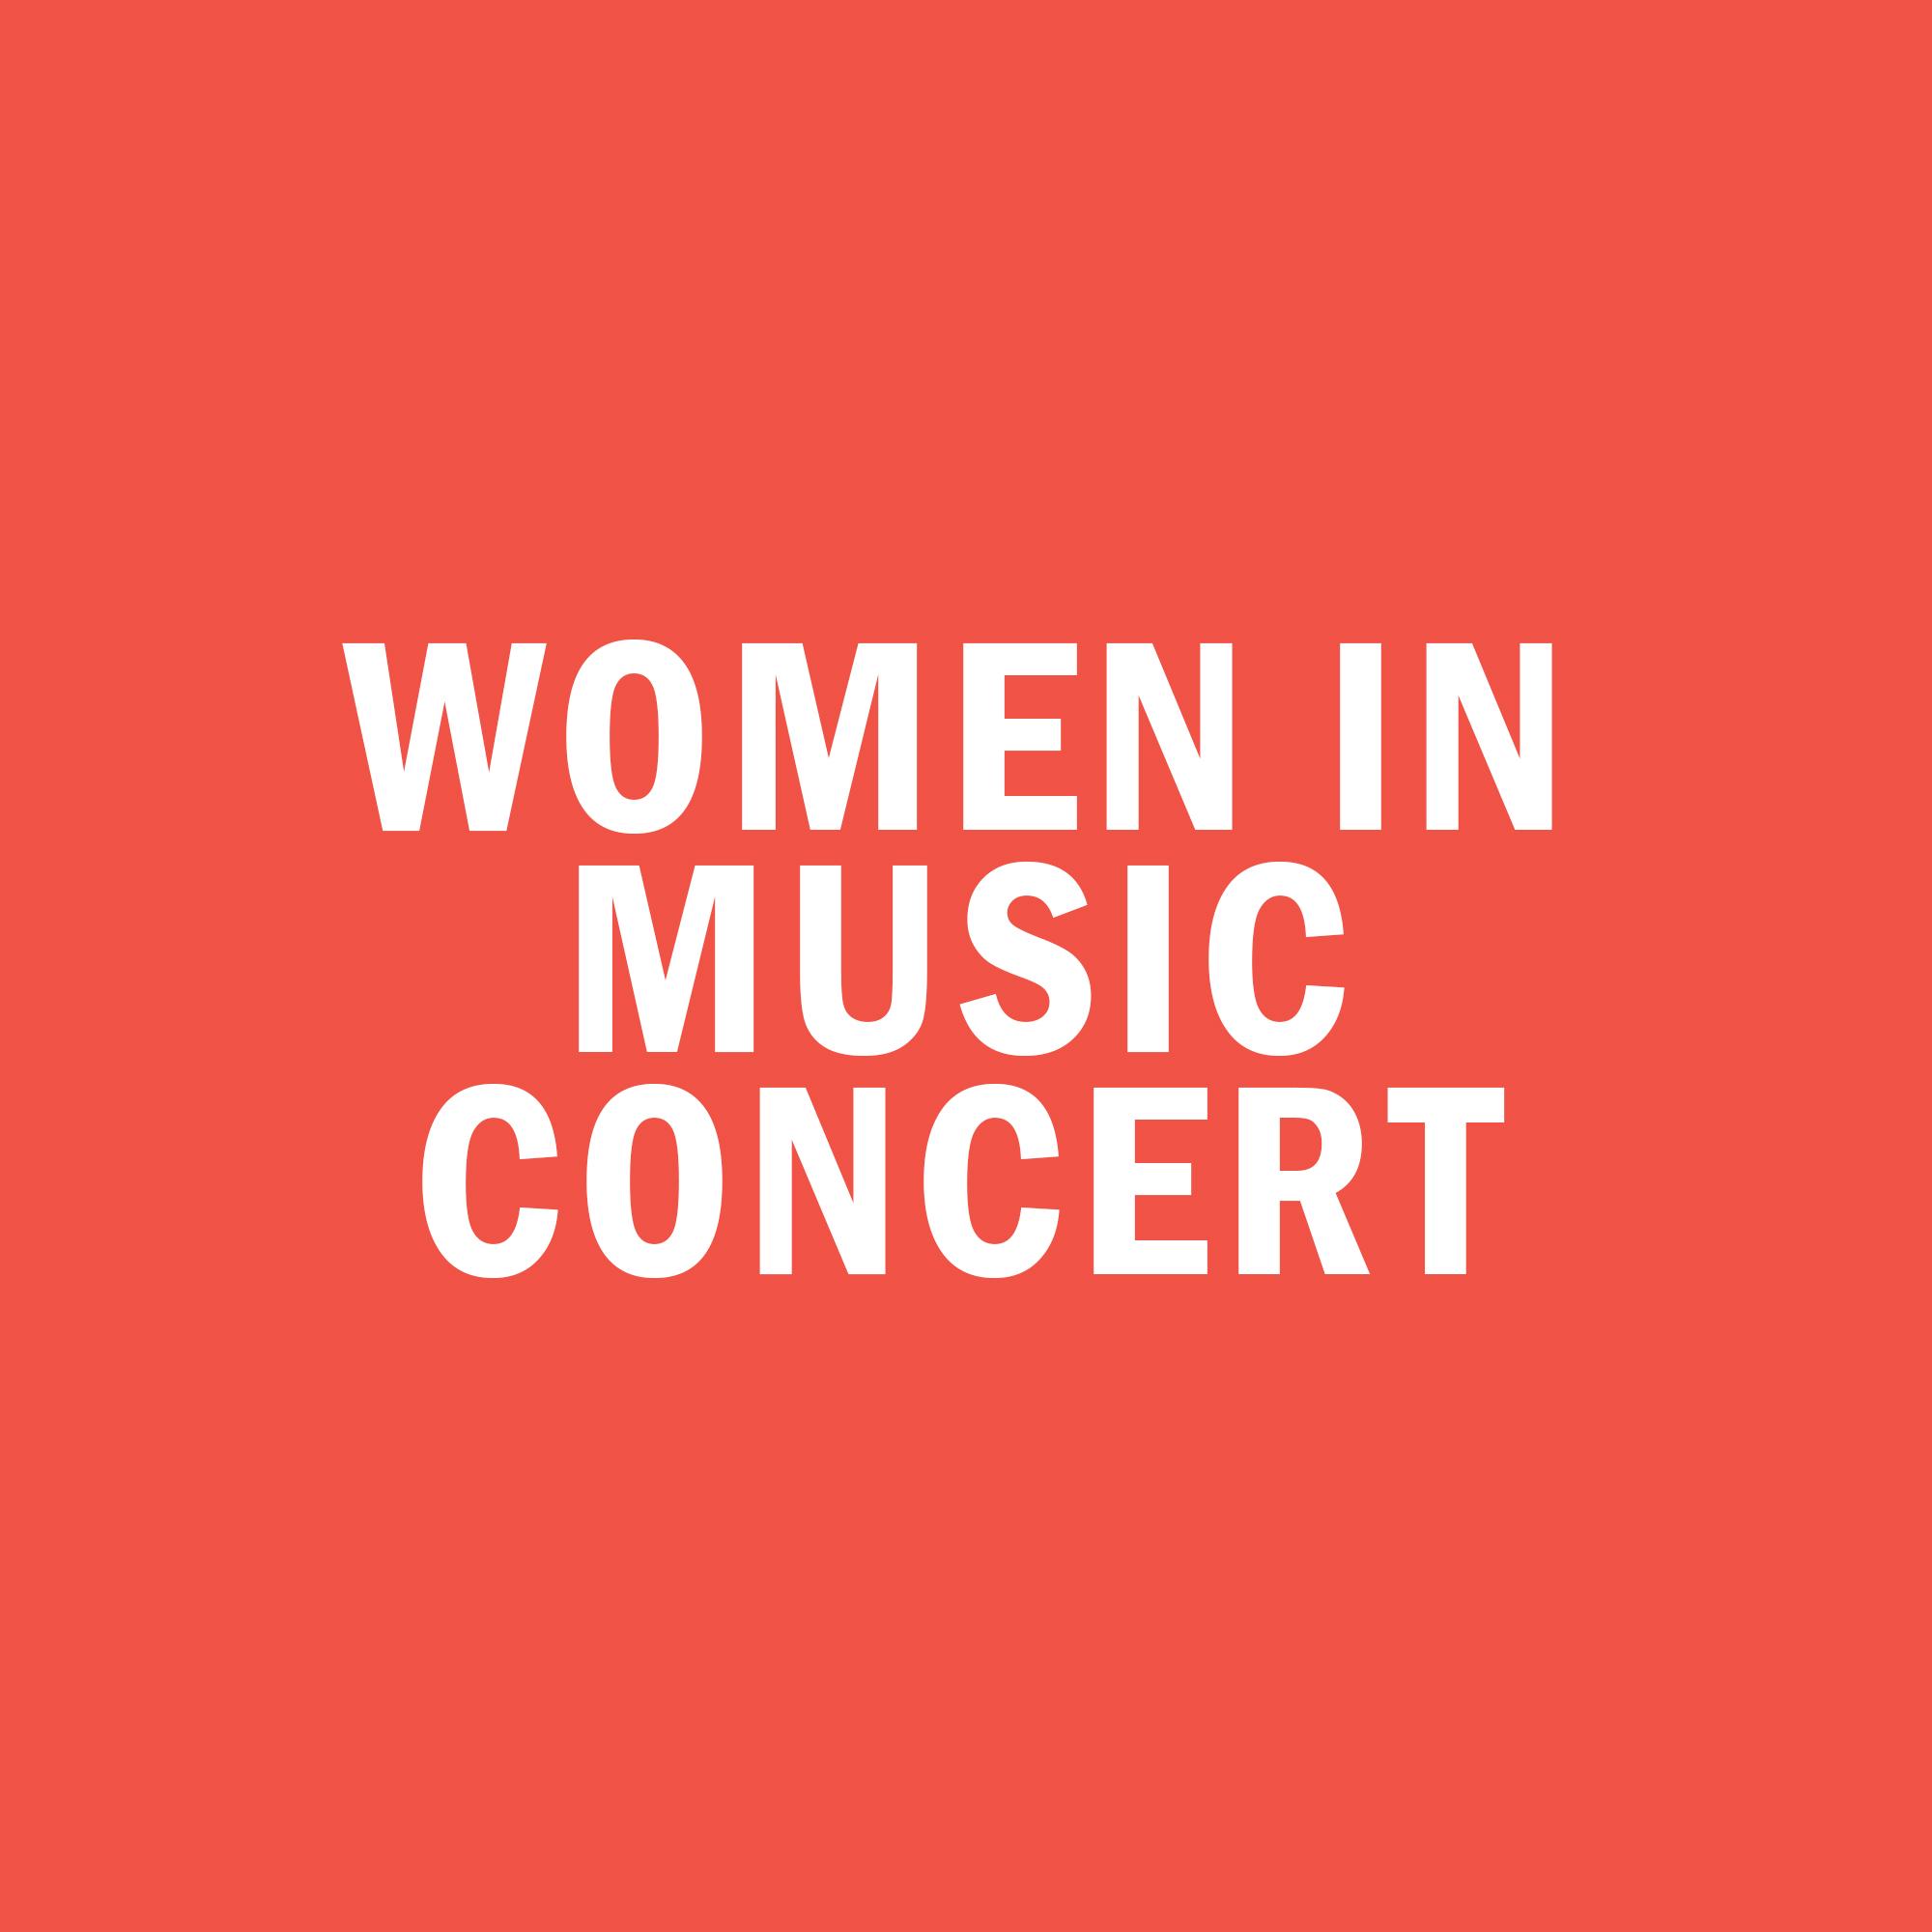 women in music concert.jpg